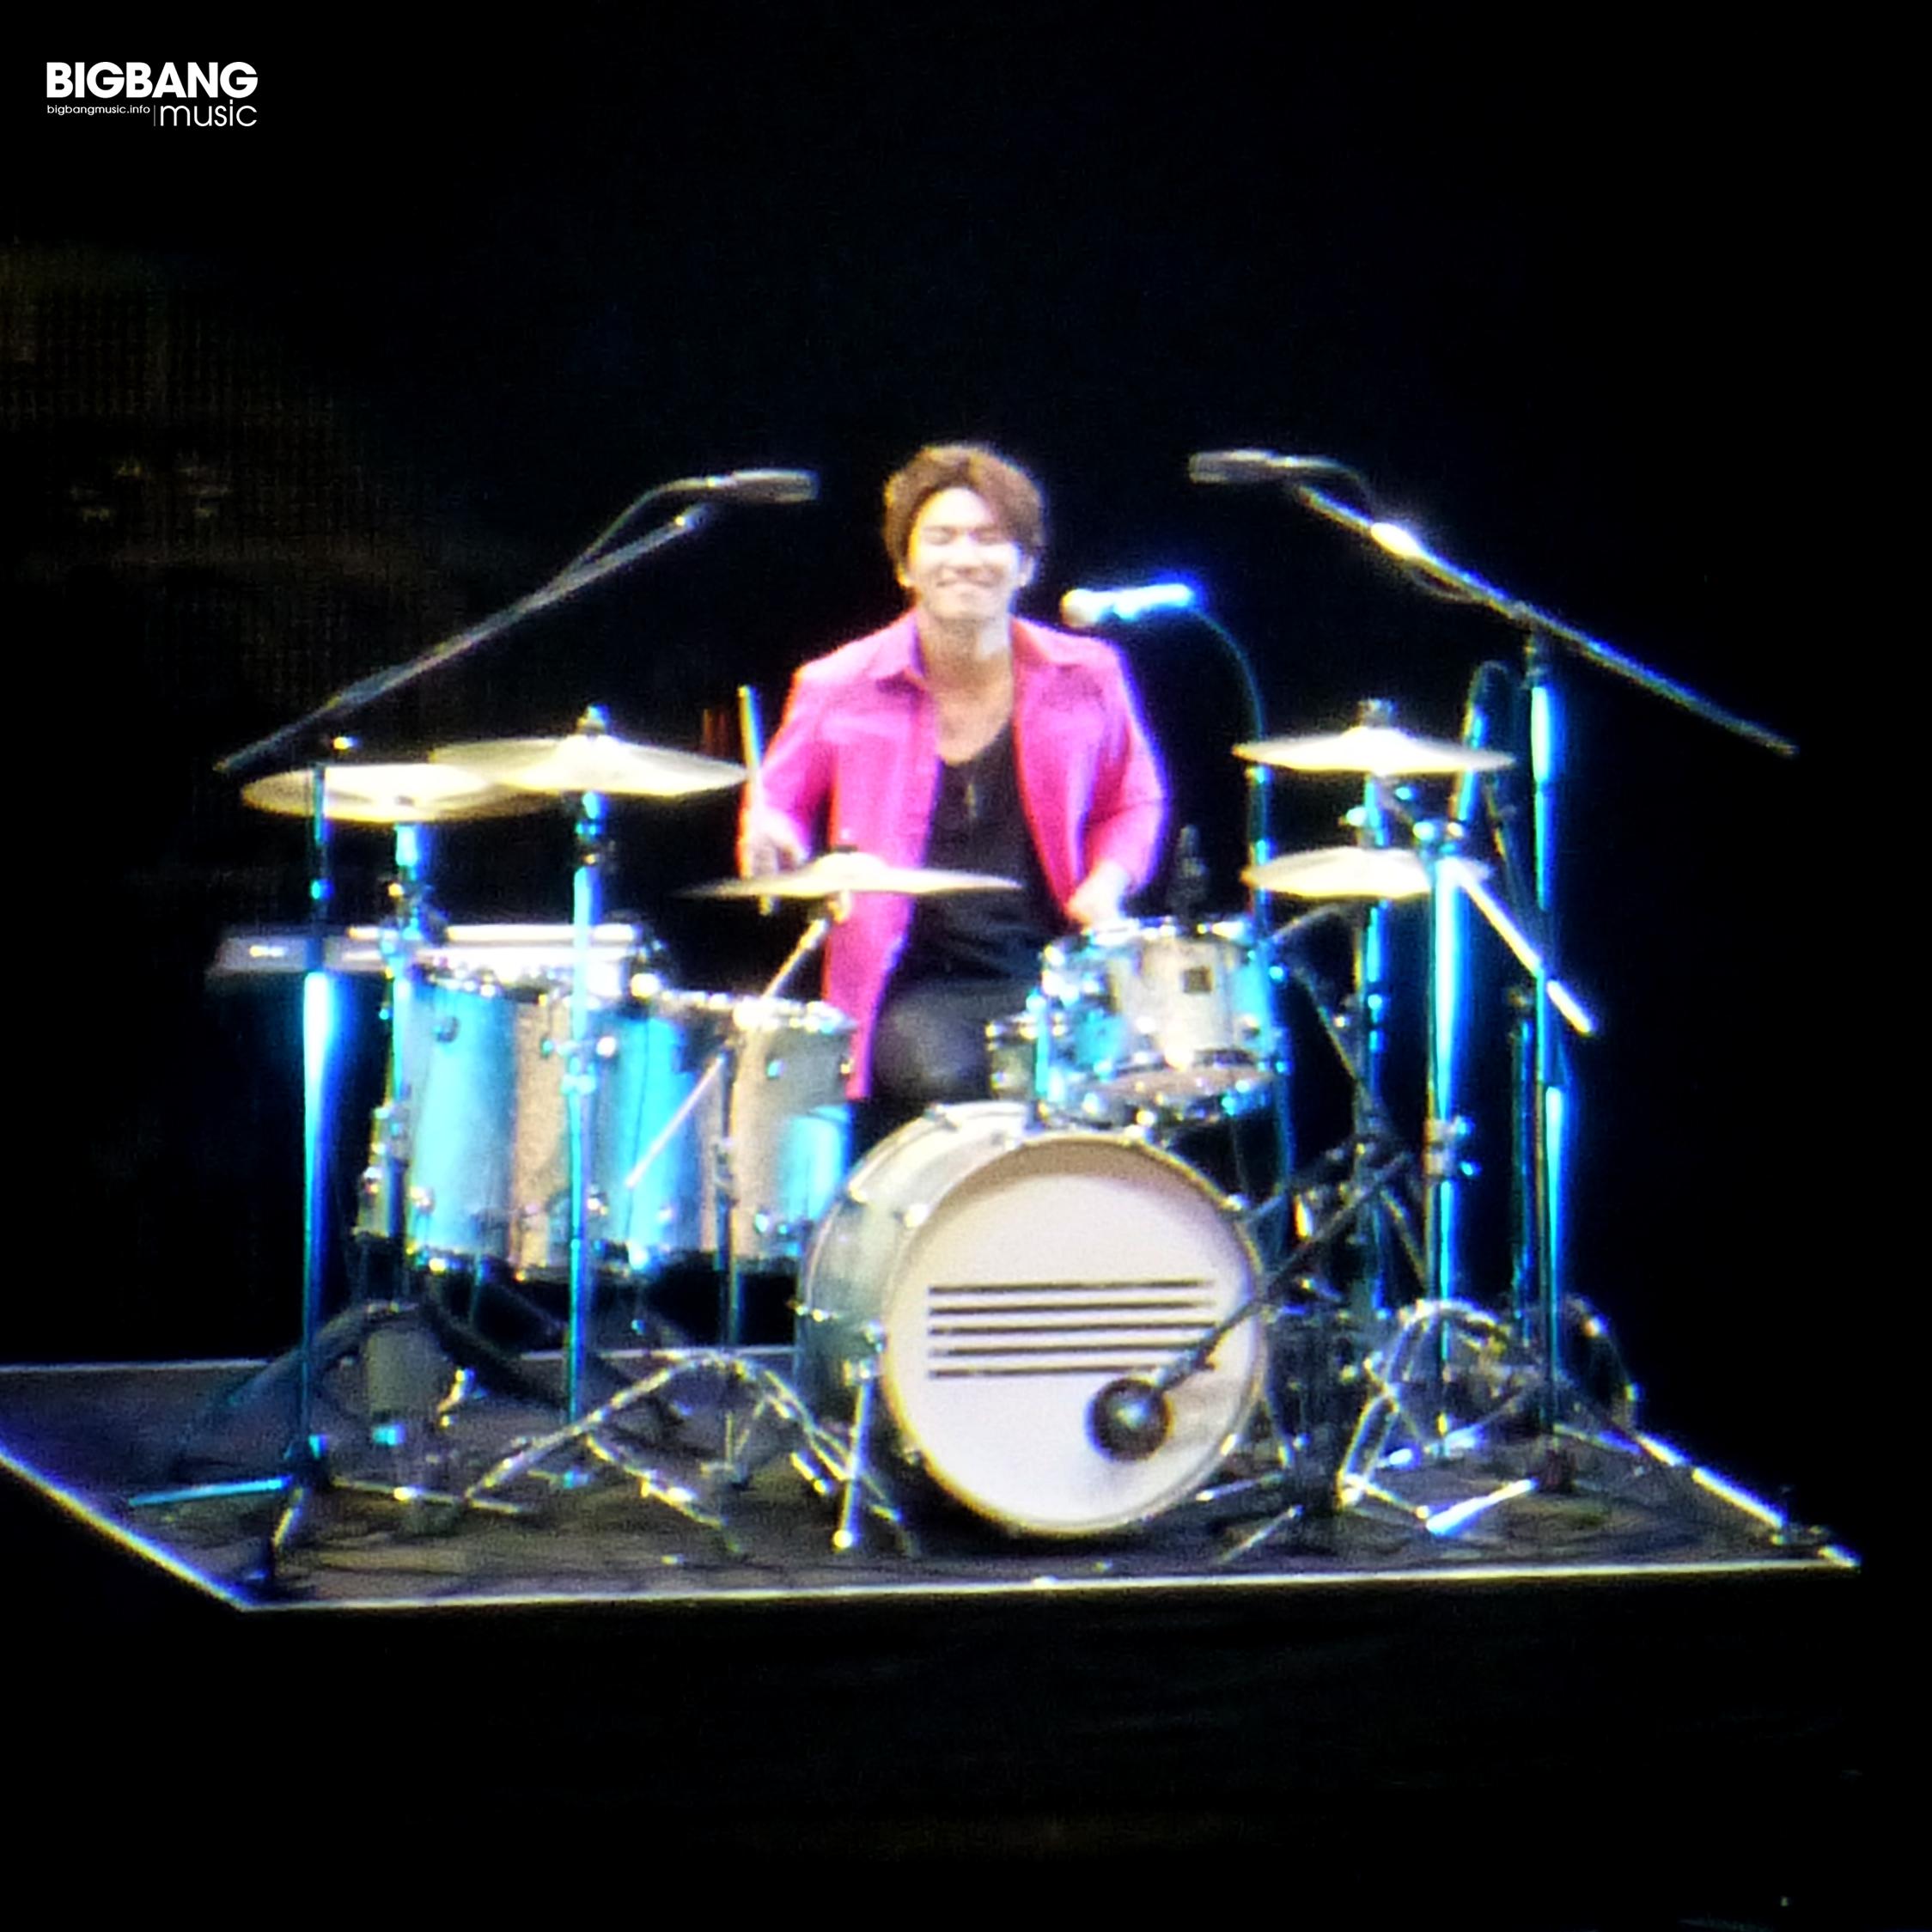 BIGBANG-Osaka-Day-5-2016-01-10-BIGBANG-09.jpg